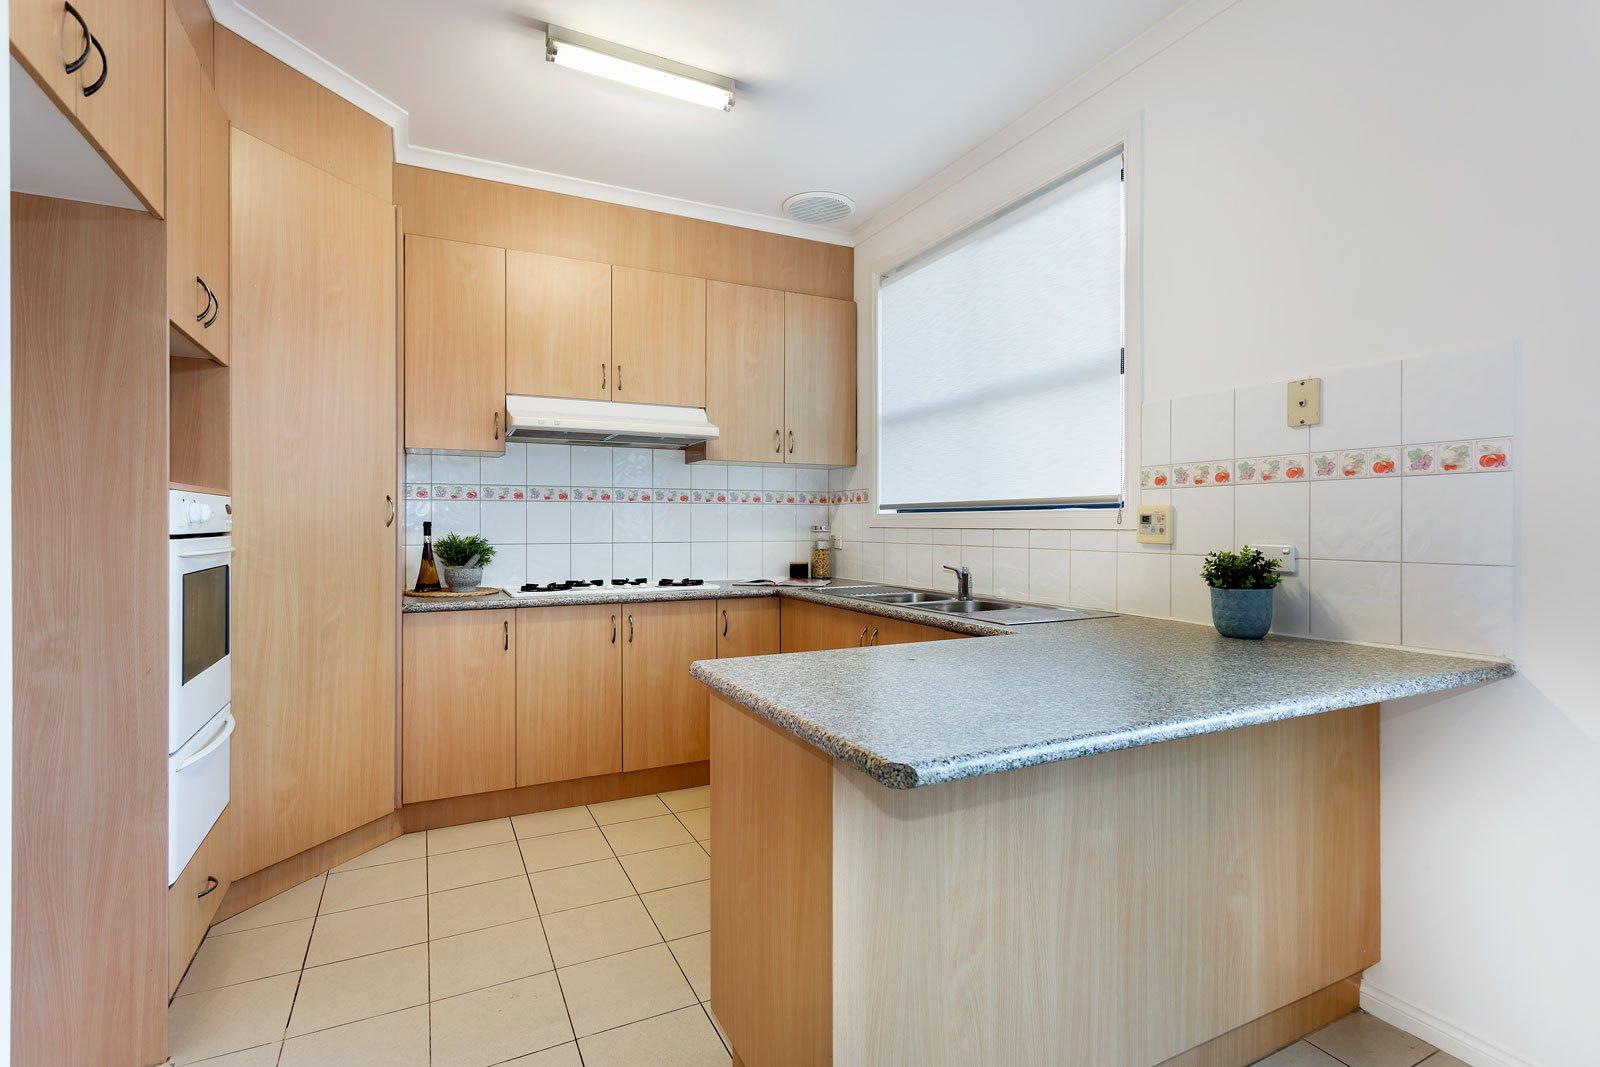 15 Greer Street, Footscray, VIC, 3011 image 2